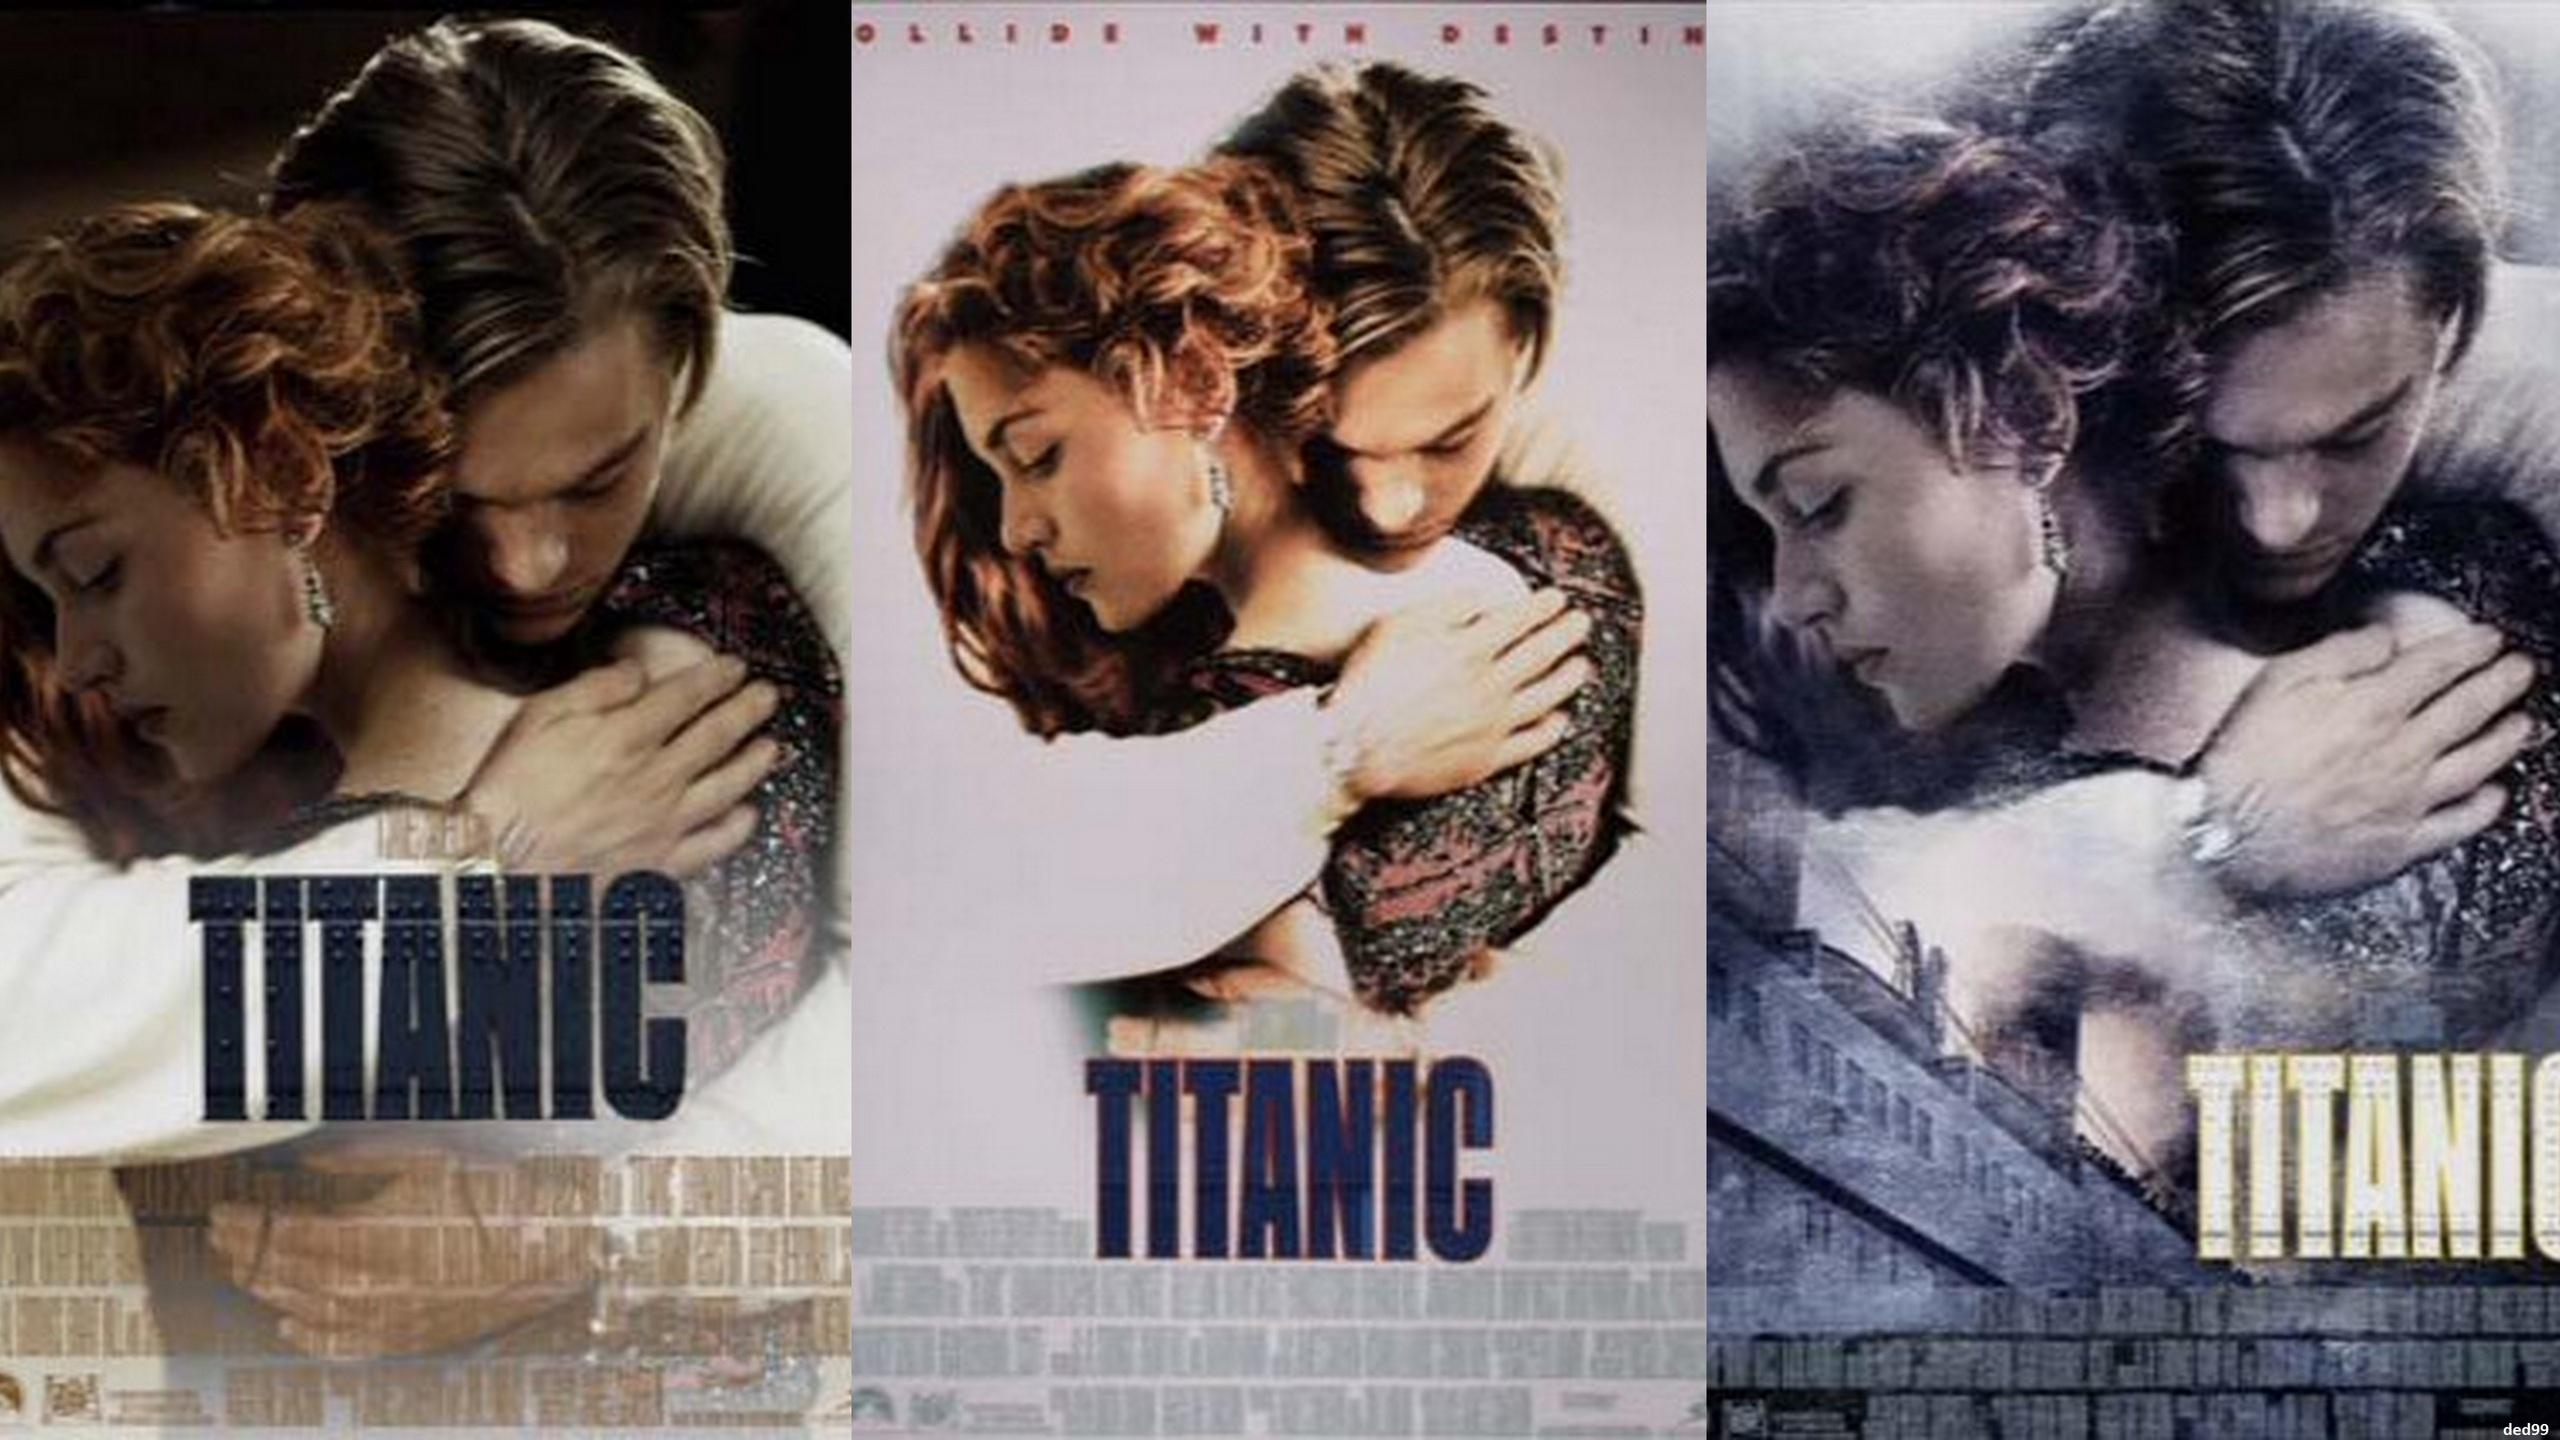 Kate Winslet Titanic Painting Scene Titanic jack rose titanic